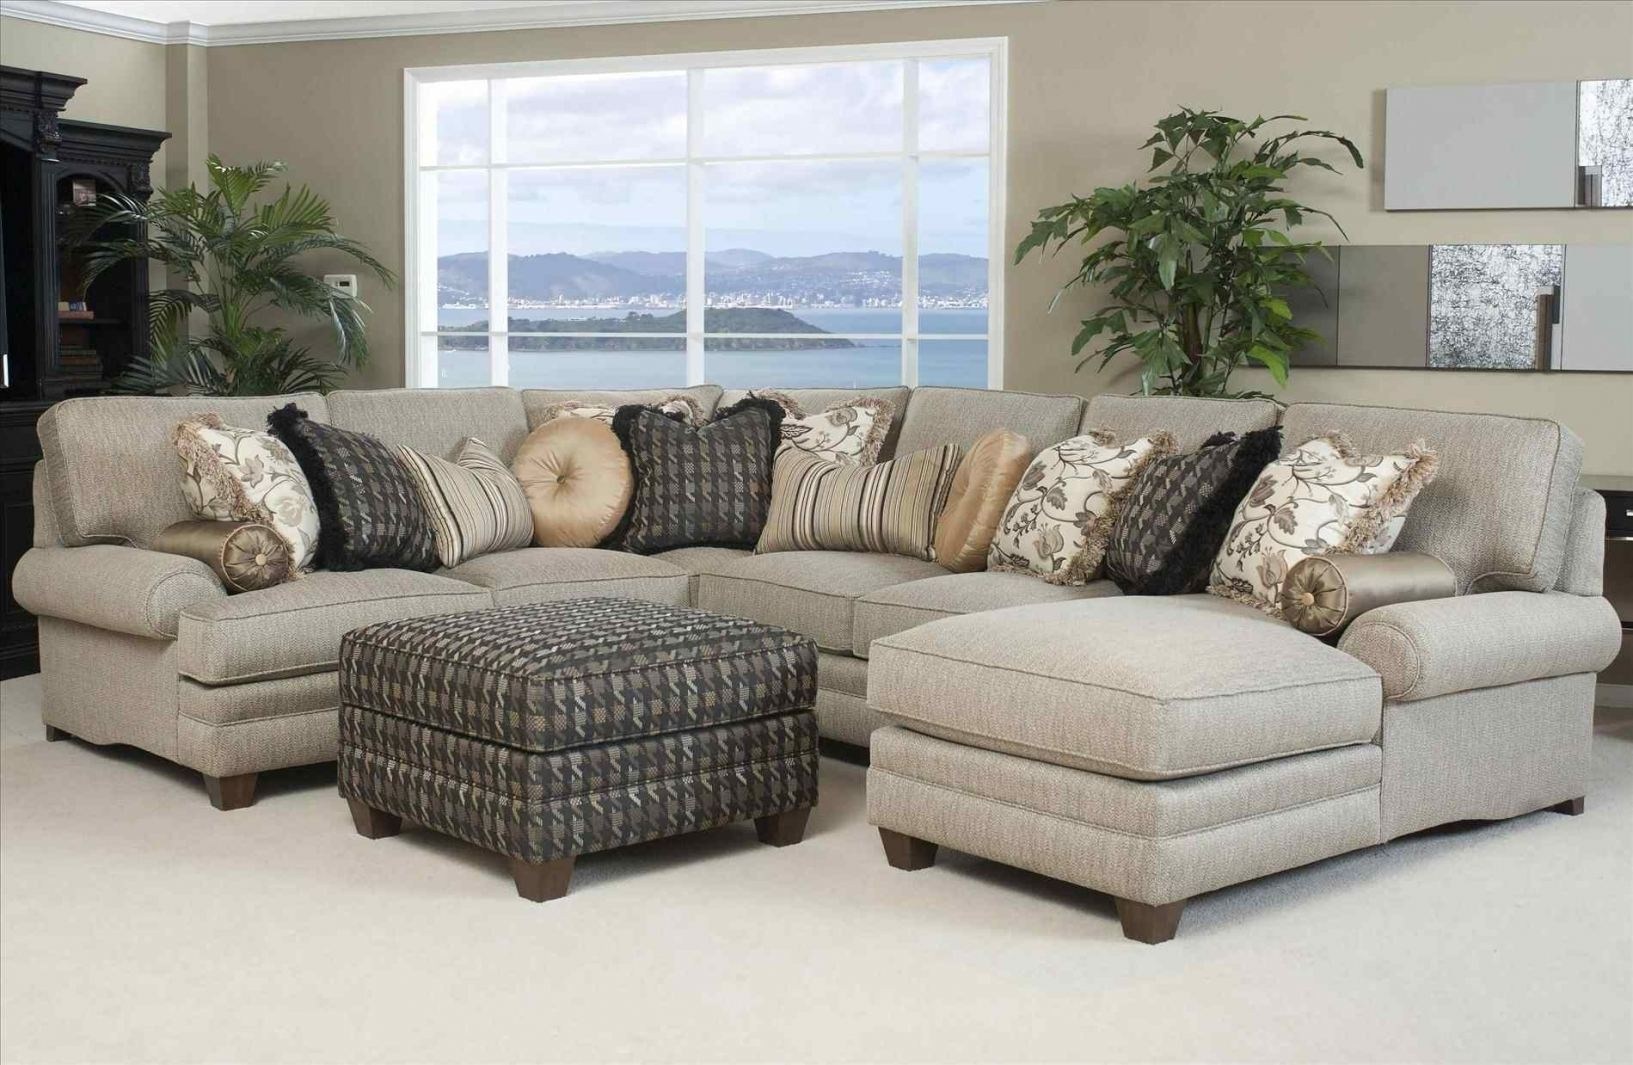 8 piece leather sectional sofa reading blackburn sofascore 10 collection of portland sofas